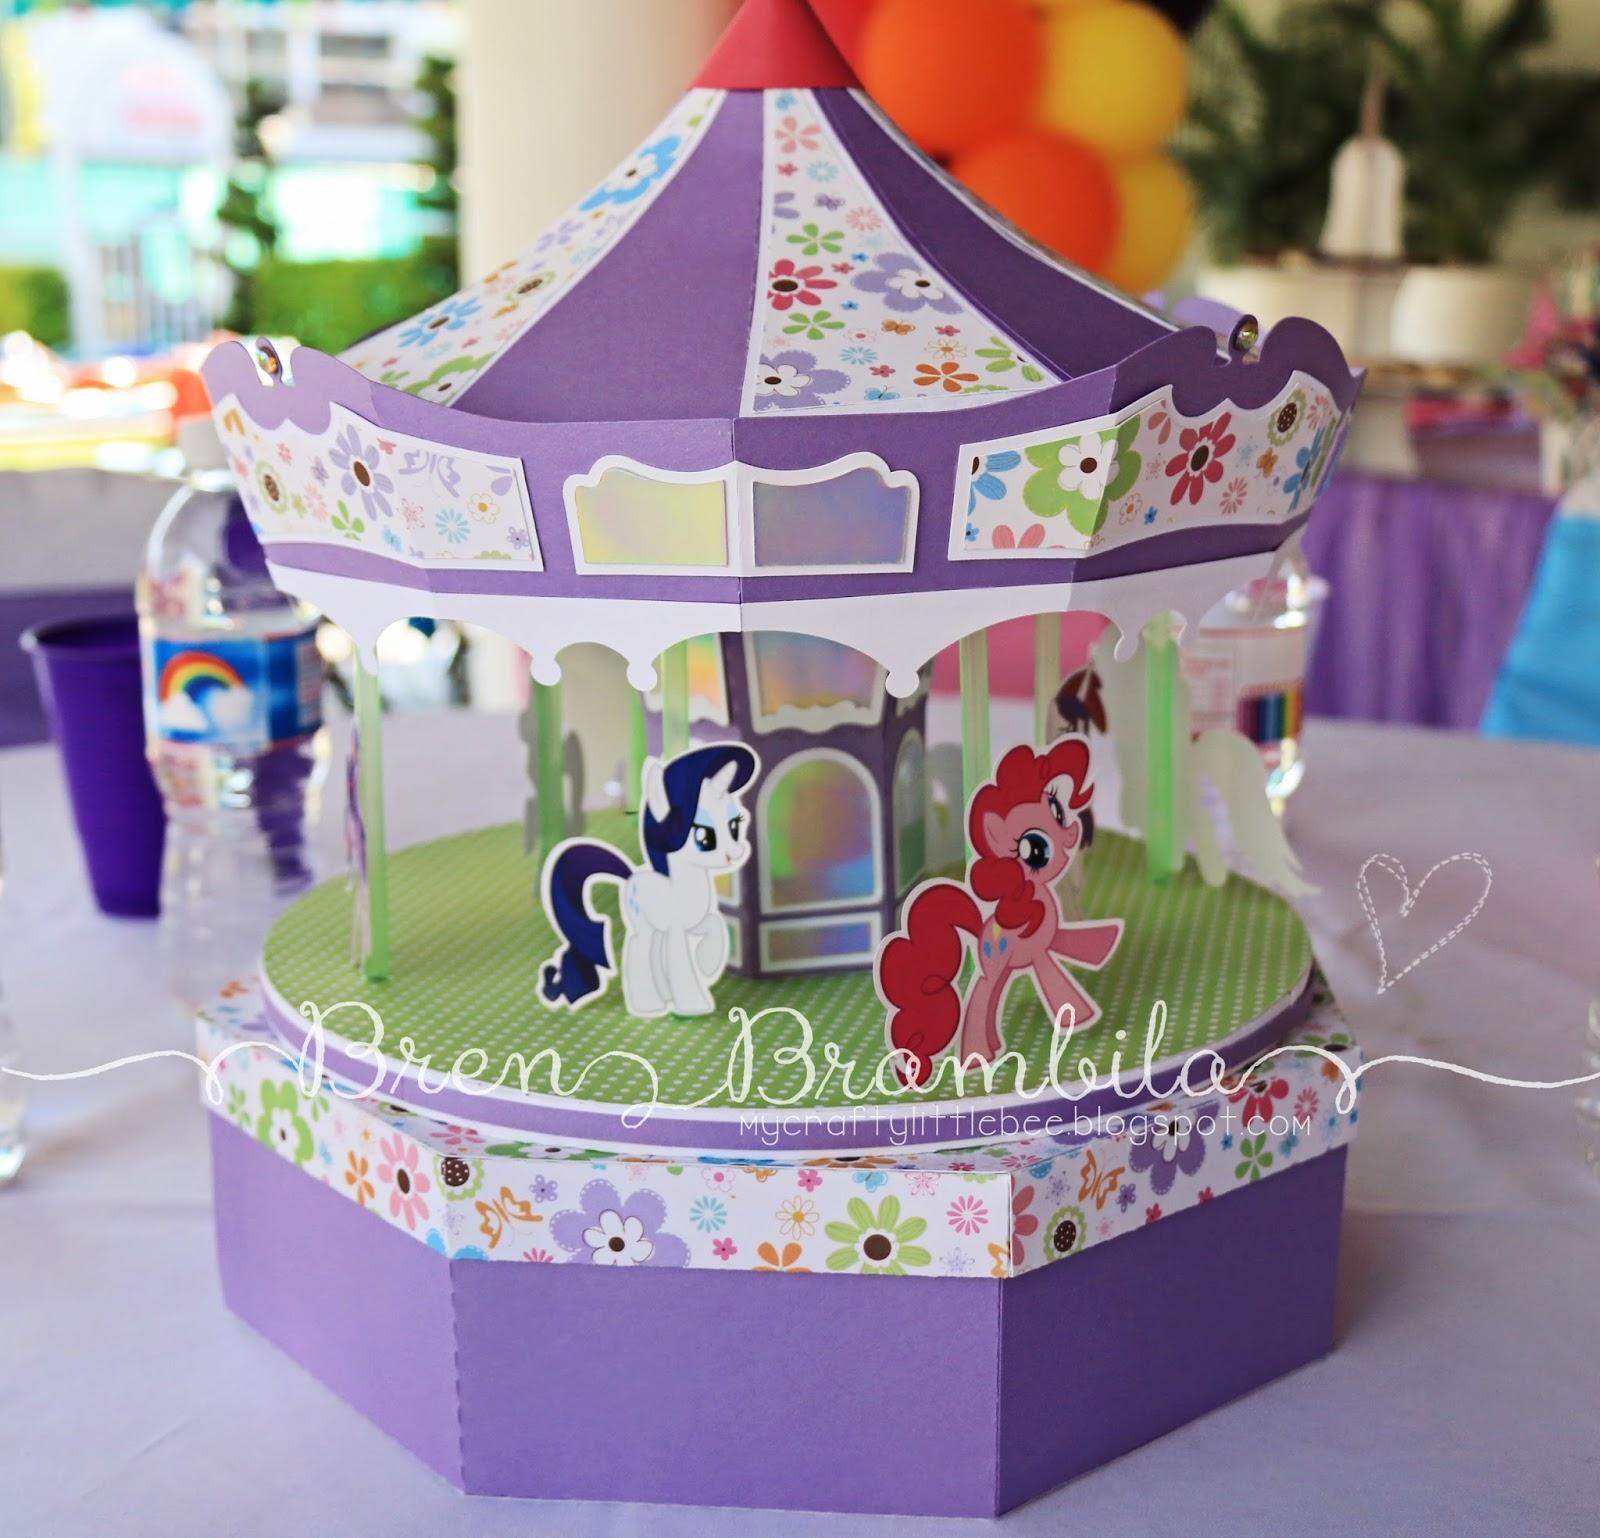 Trendy centros de mesa para fiesta infantil for Mesa infantil